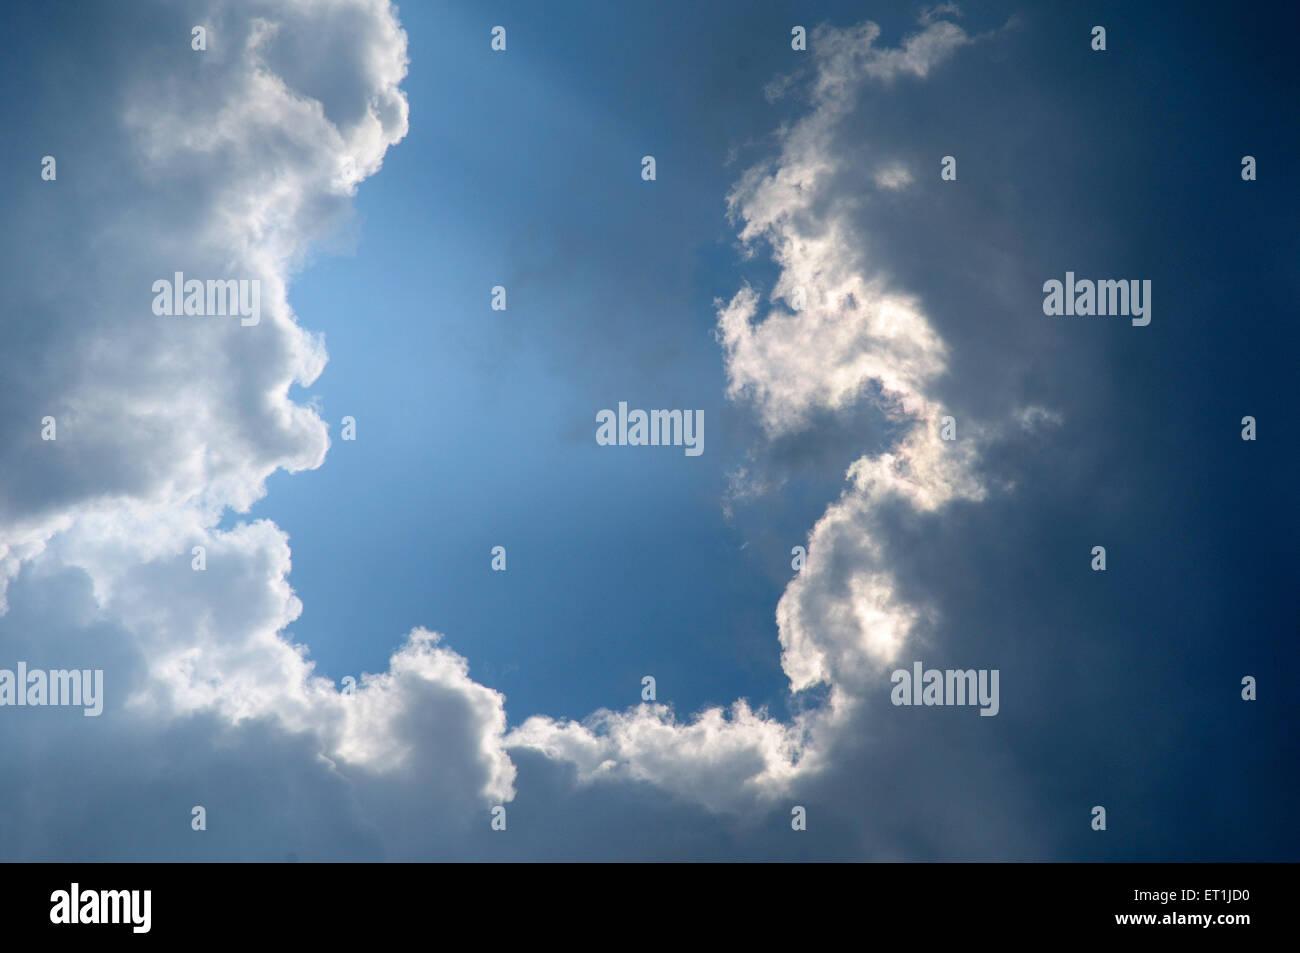 Phänomen der Wolkenbildung; Pachmarhi; Madhya Pradesh; Indien 3. Oktober 2008 Stockbild